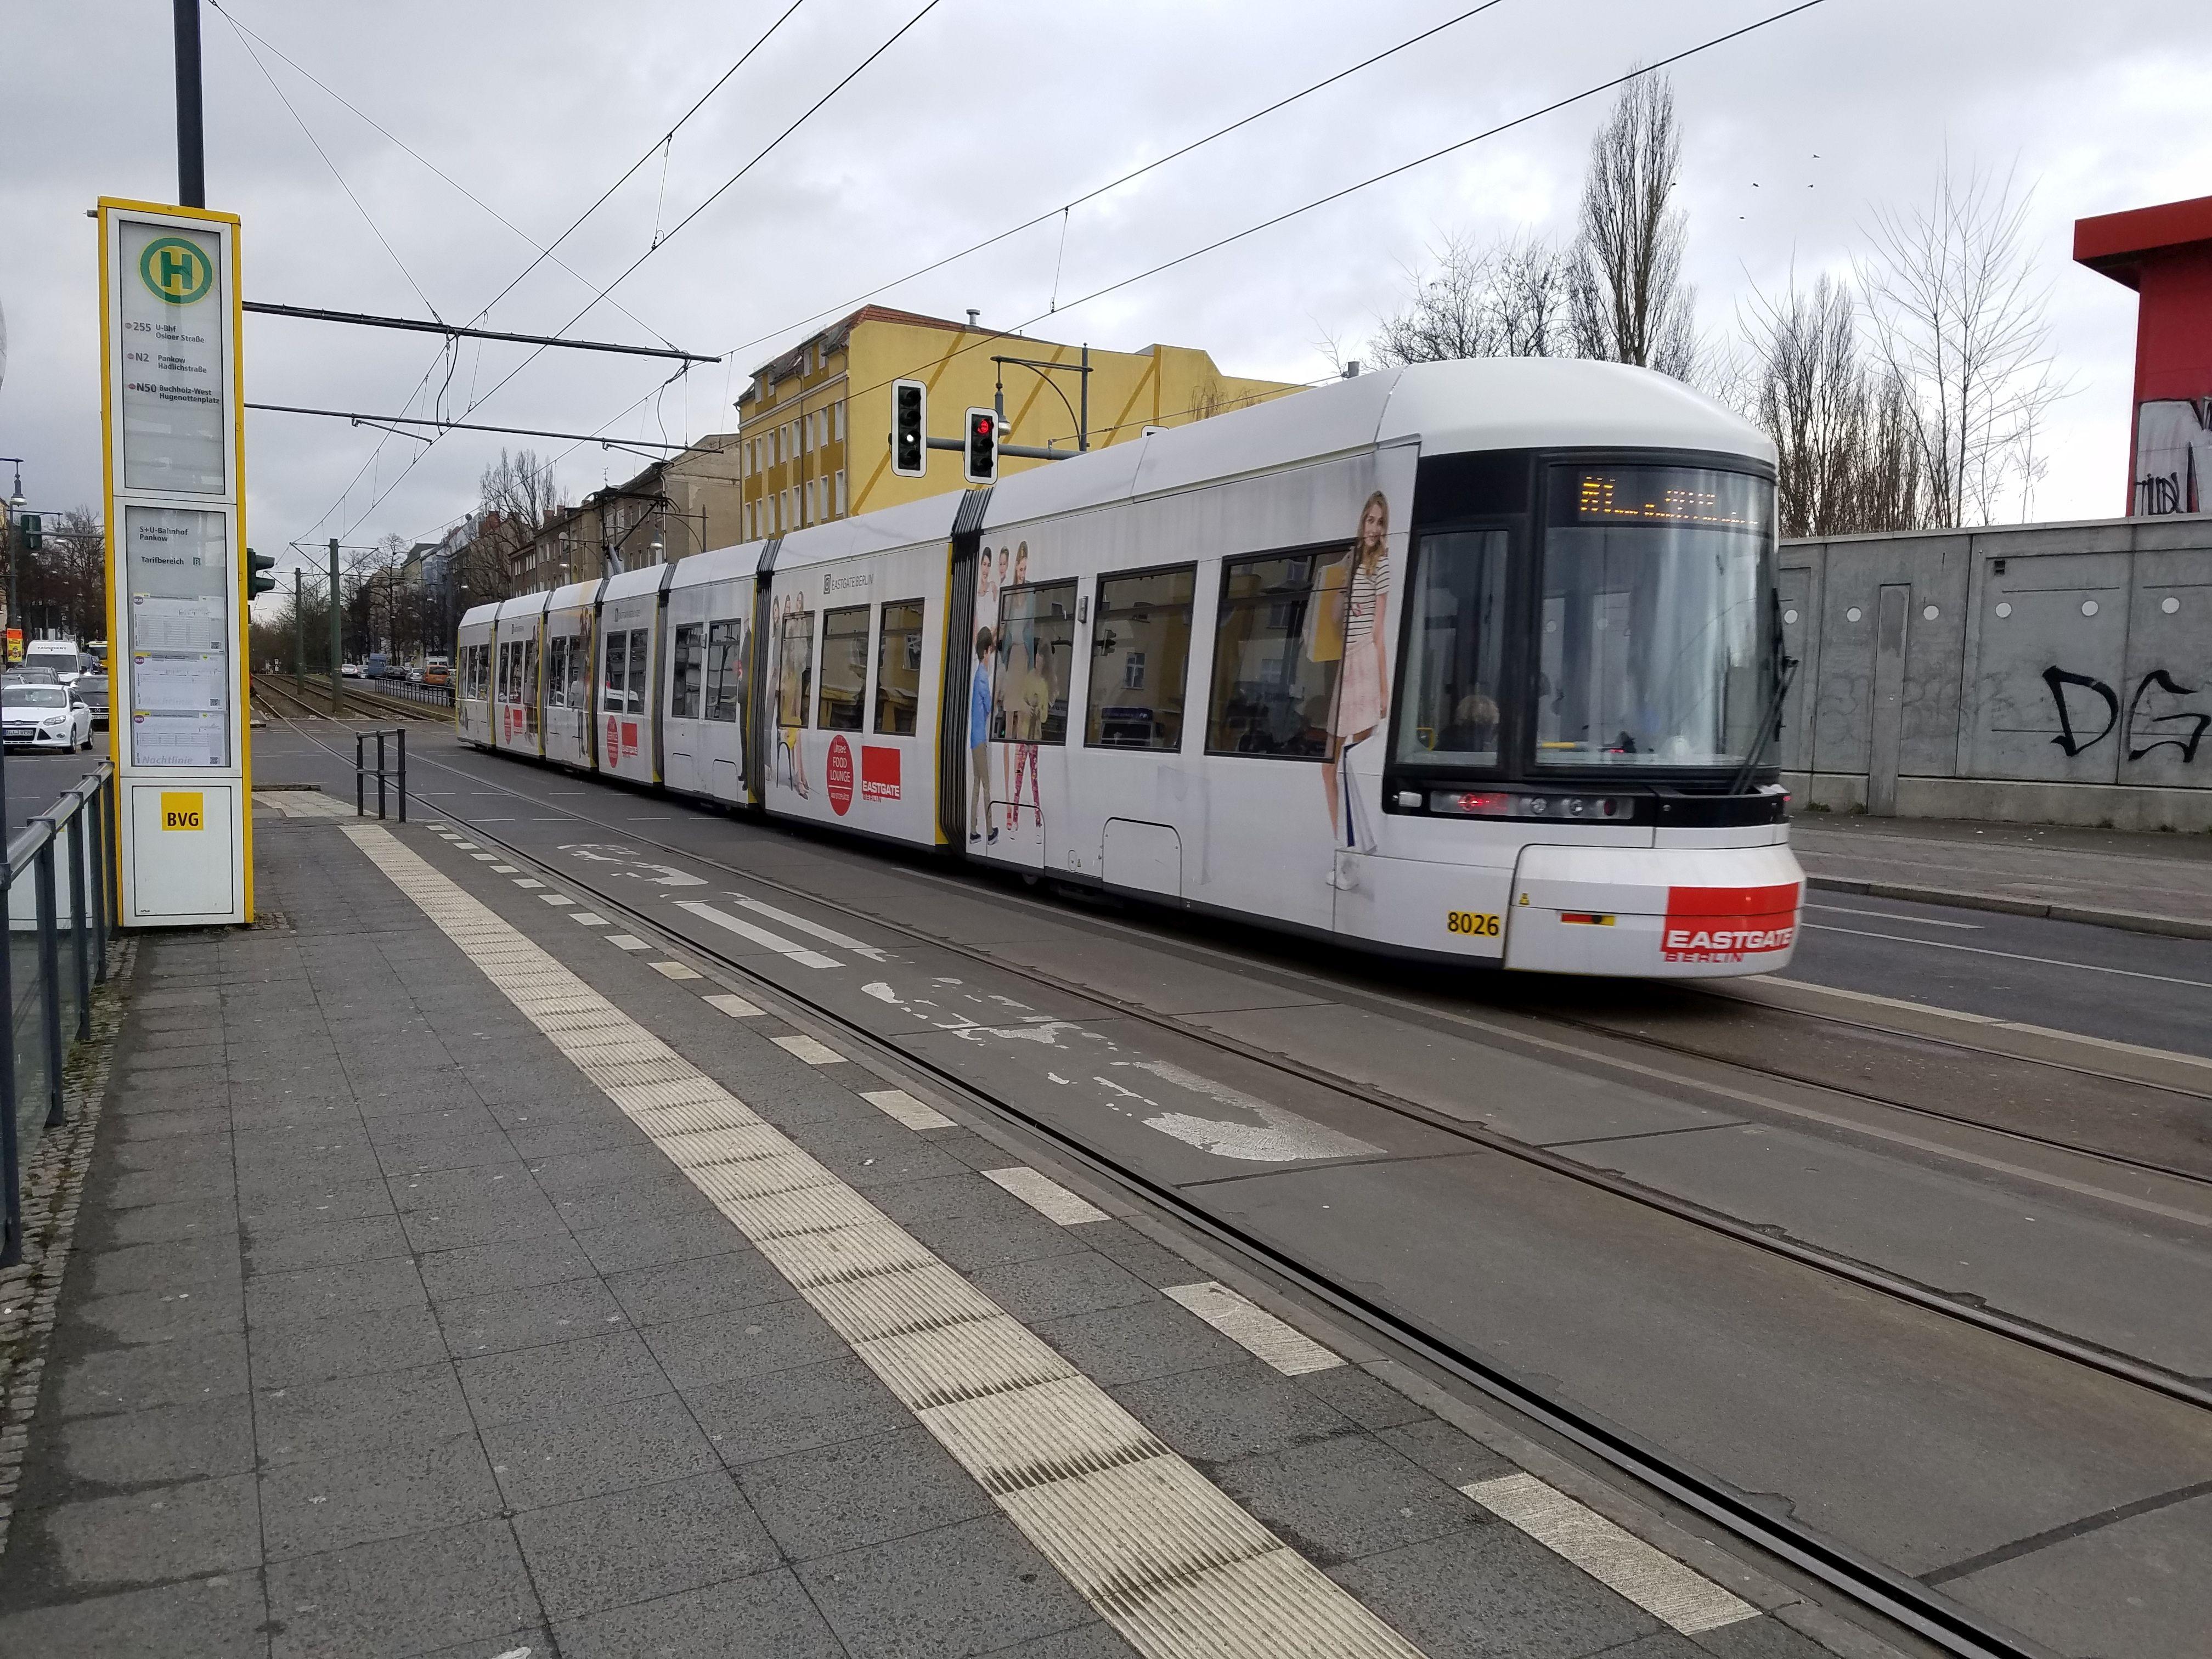 Foto: Straßenbahn 8026, Typ Flexity ERL, Pankow, März2018